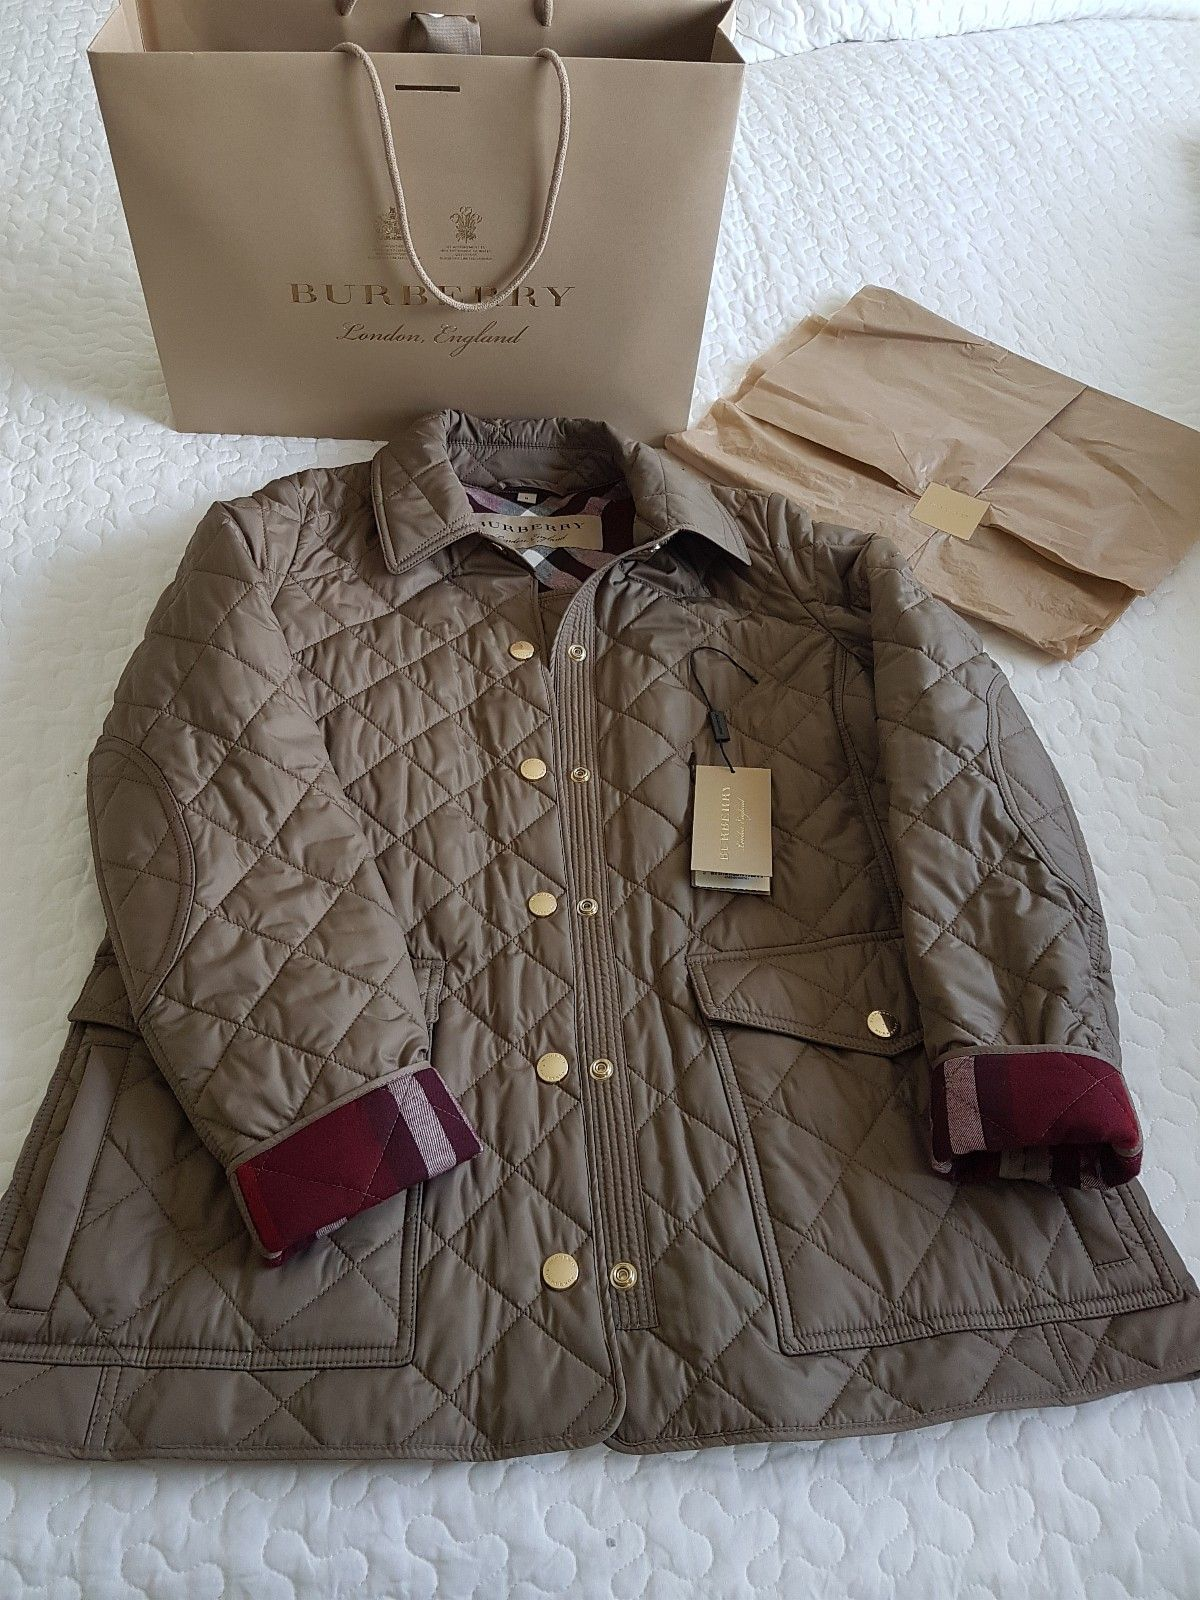 396172ba Burberry jakke selges billig. | FINN.no